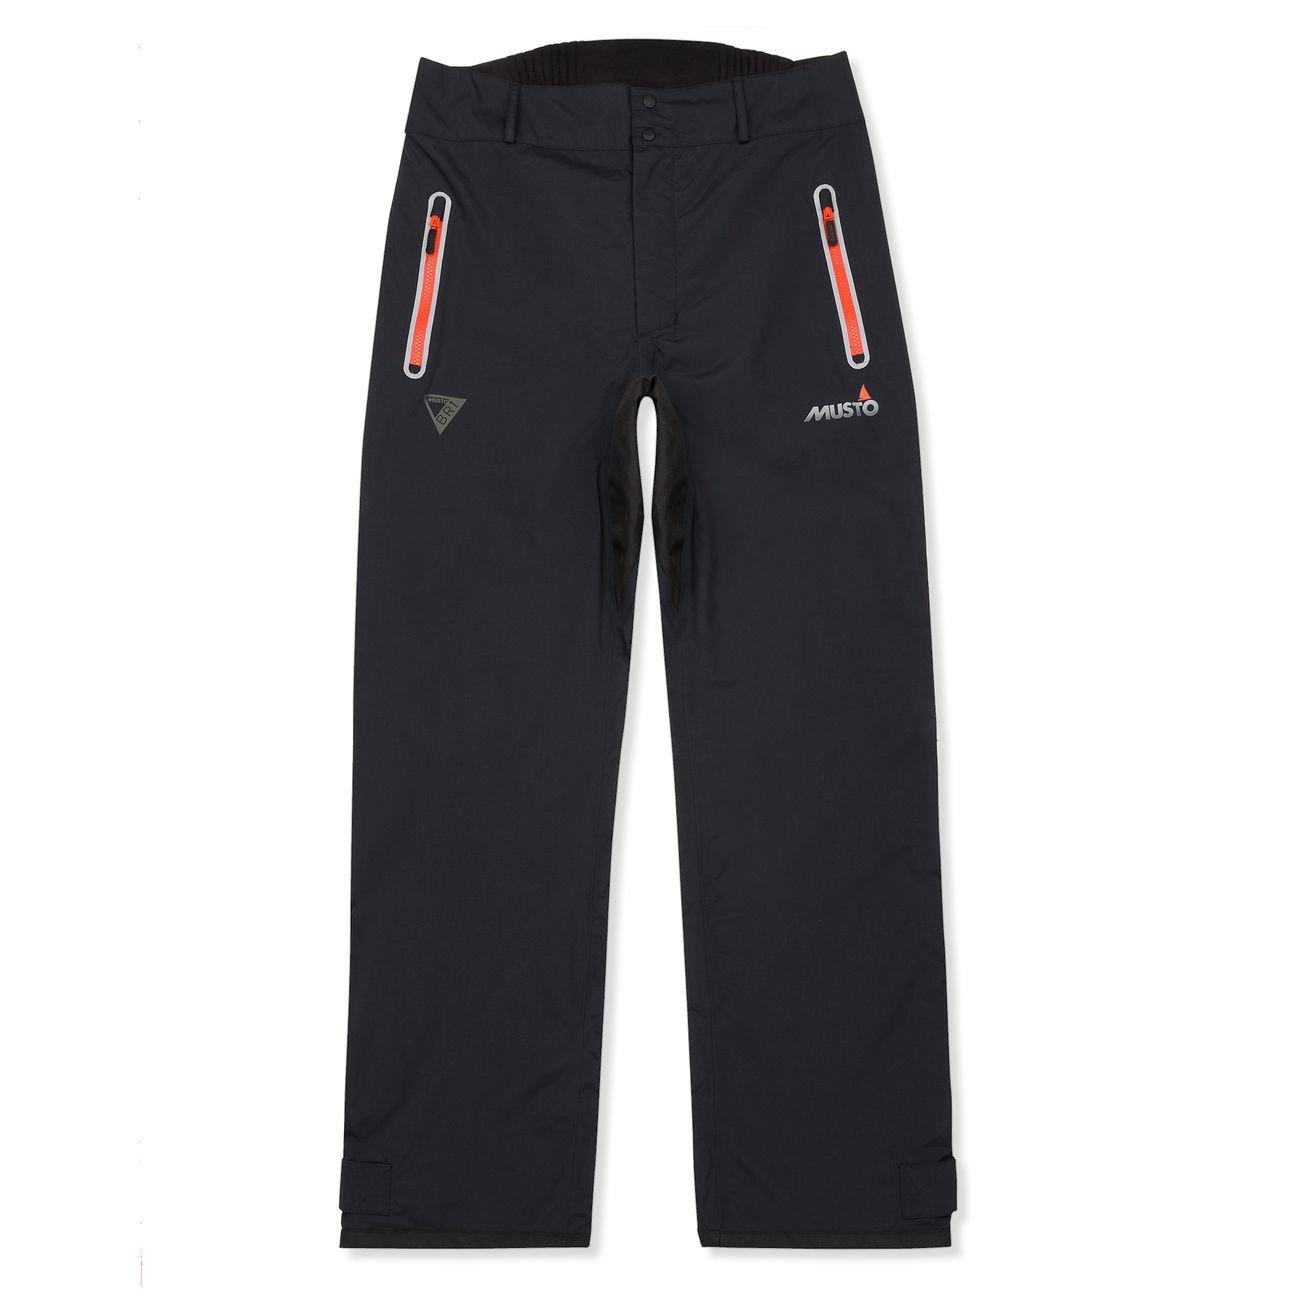 Musto BR1 Hi-Back Trousers 2017 - schwarz B06VW2SZFD Regenhosen Produktqualität